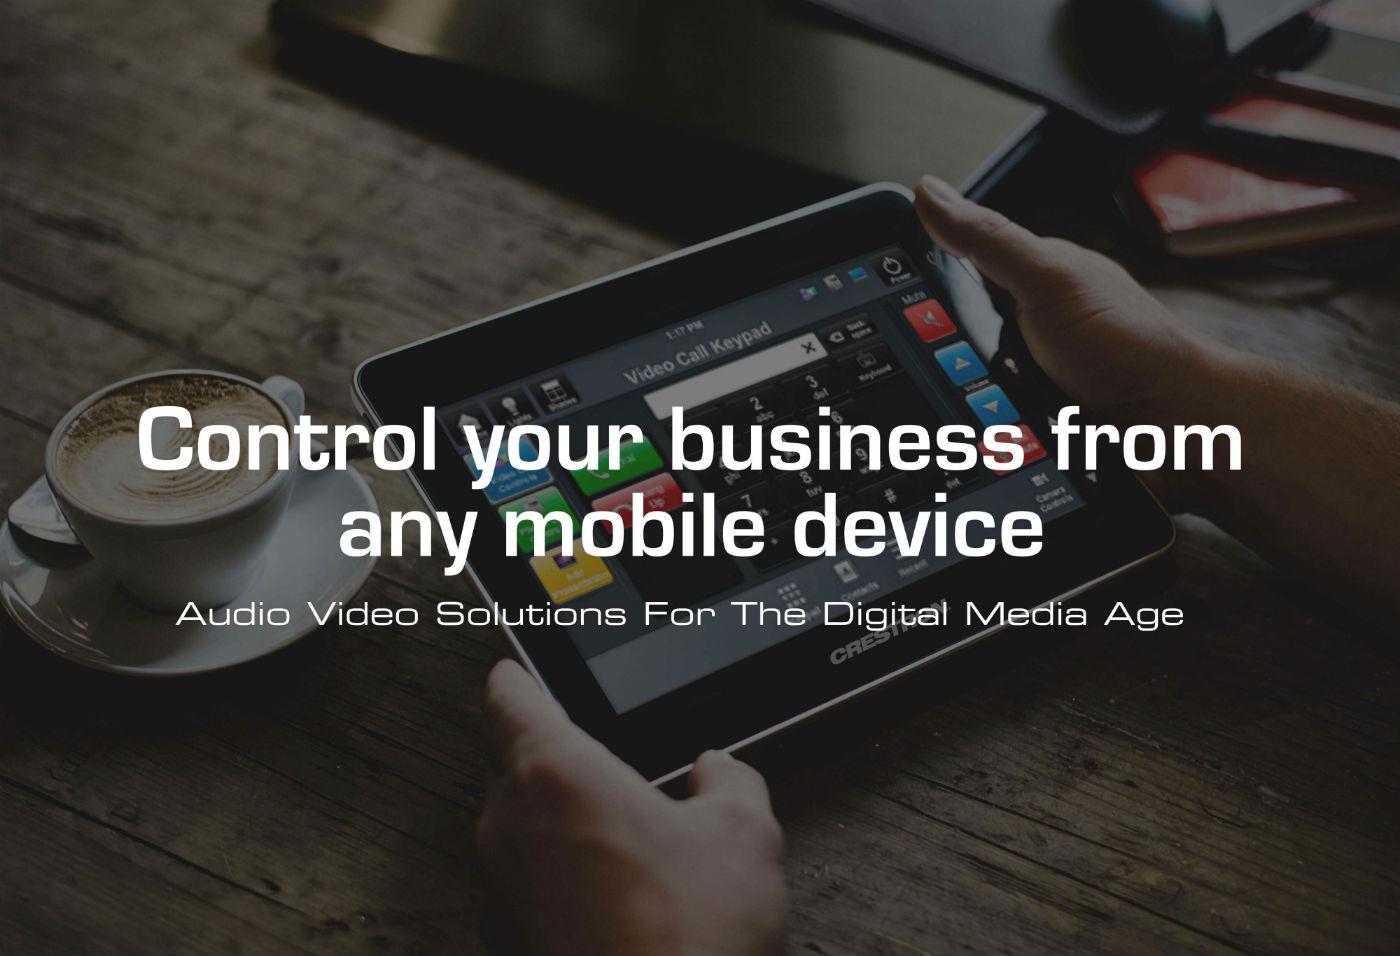 crestron-mobile-app15